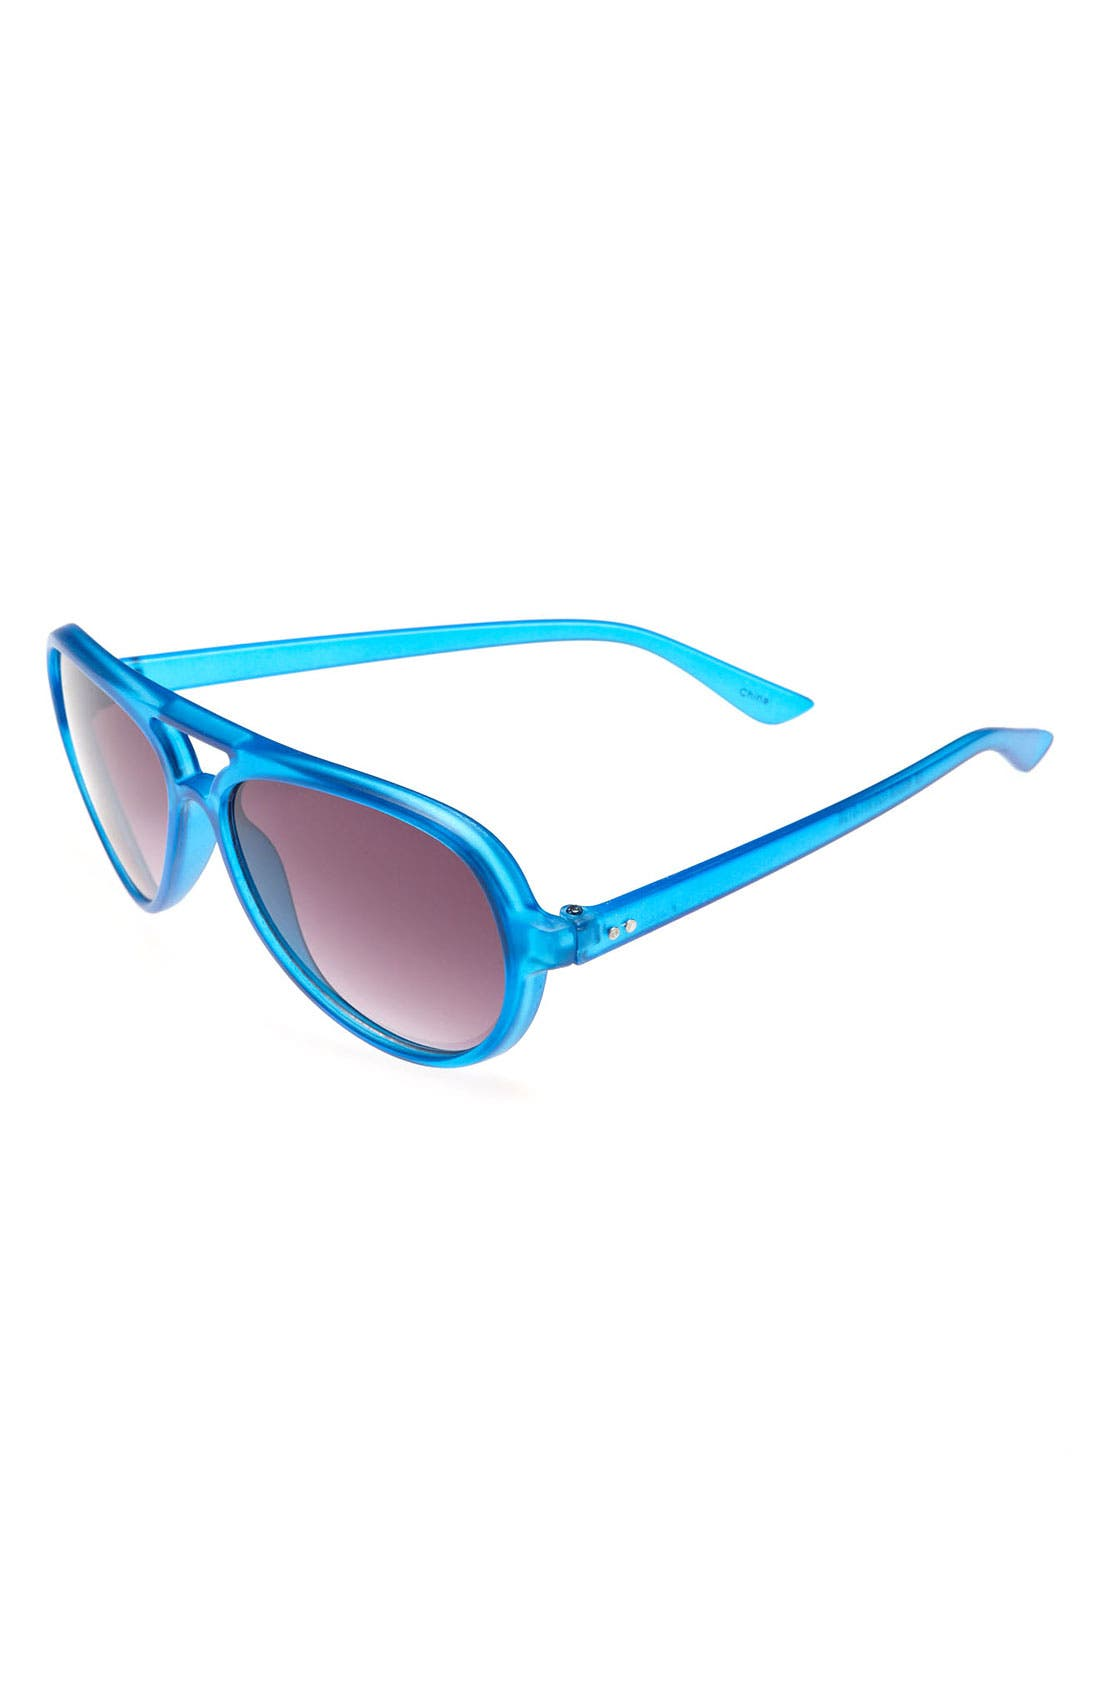 Alternate Image 1 Selected - Icon Eyewear Aviator Sunglasses (Boys)